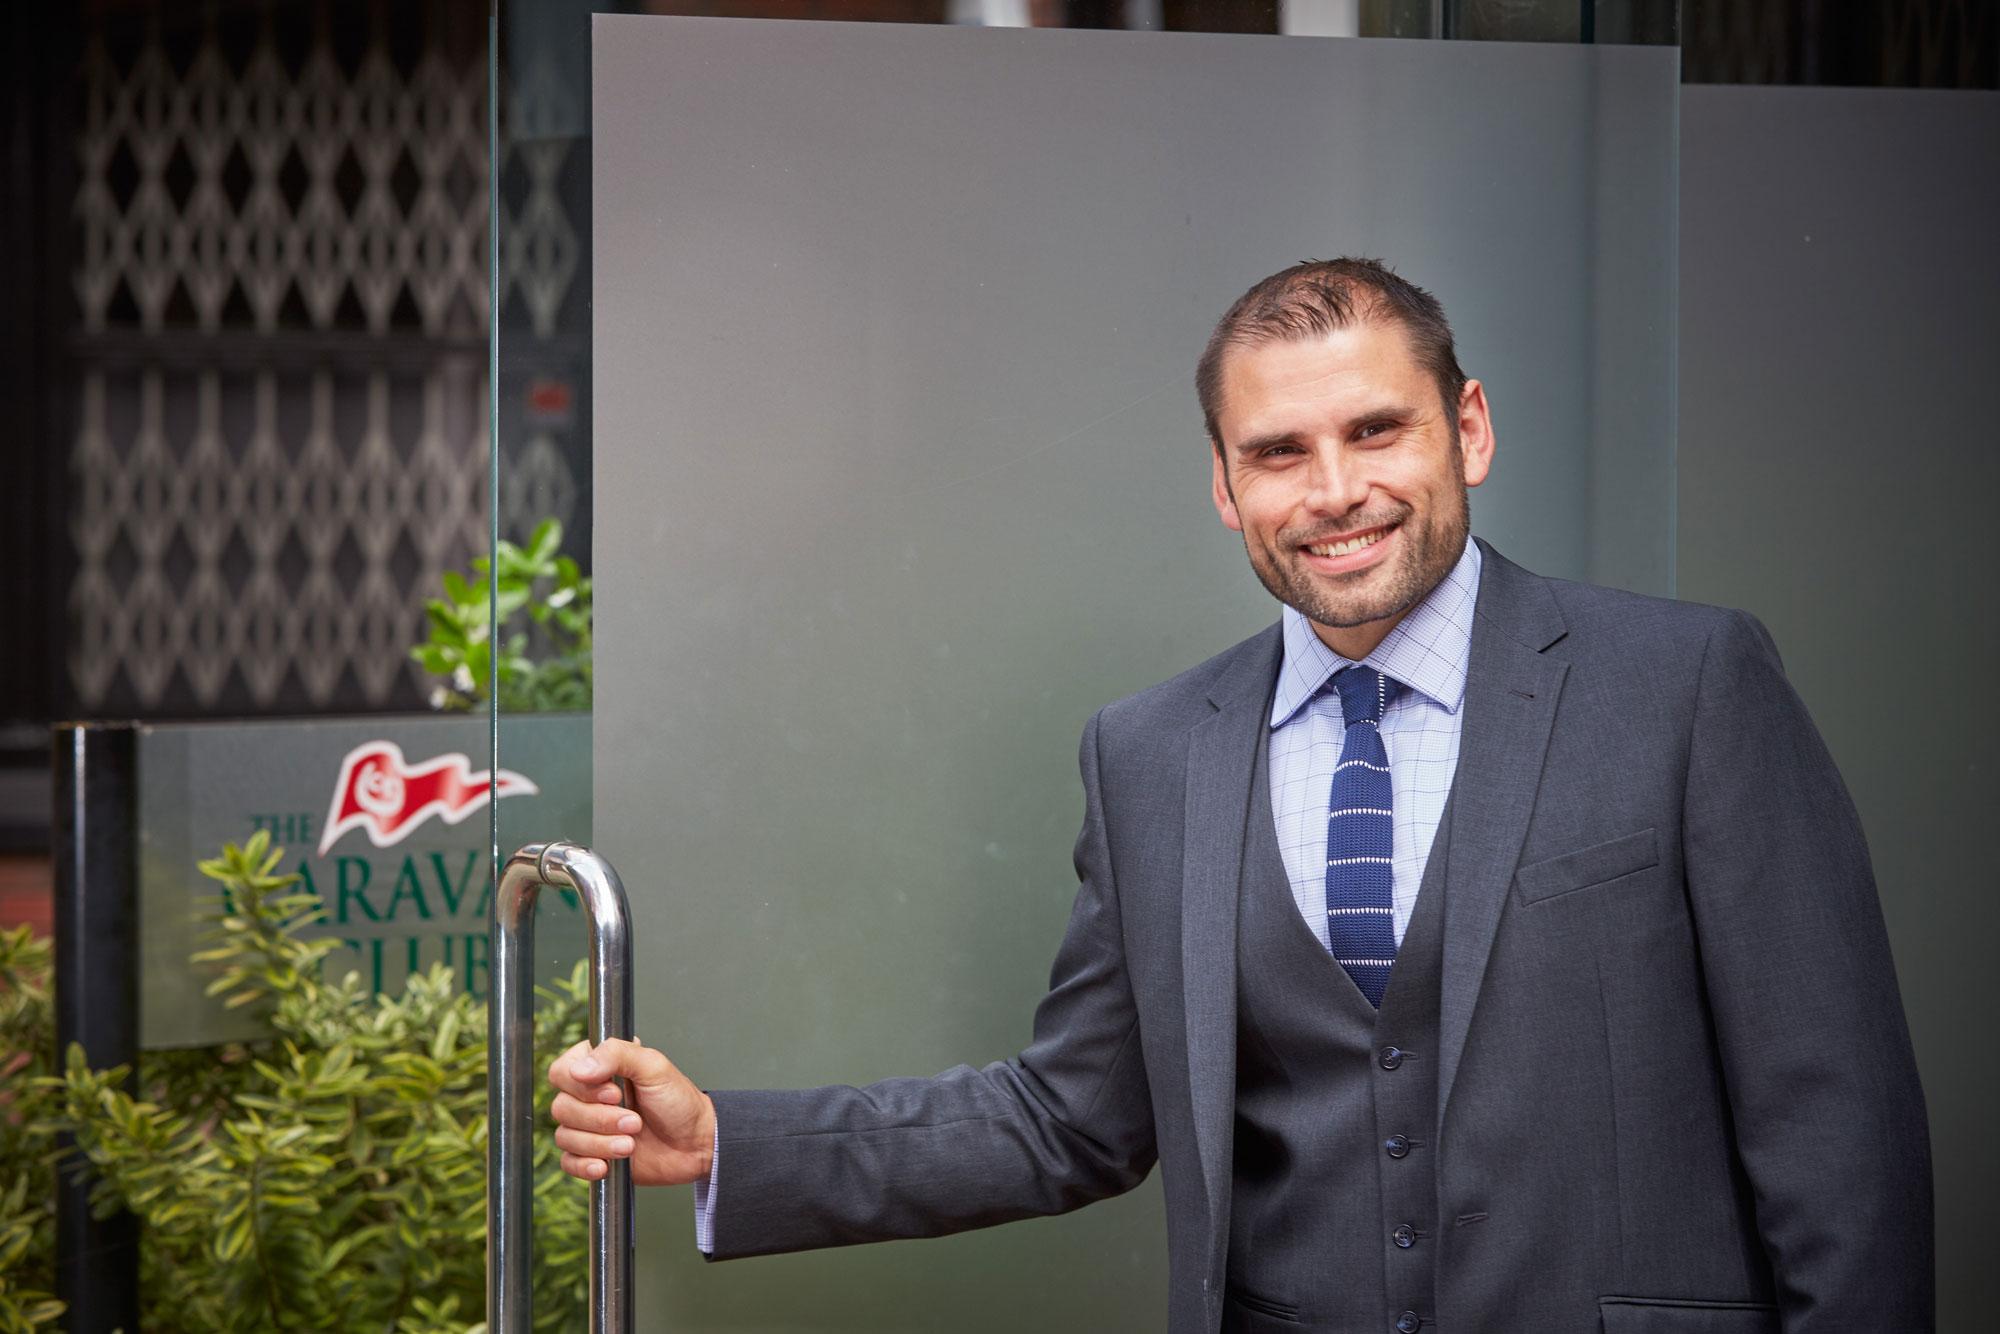 Harvey Alexander, Director Of Marketing At The Caravan Club